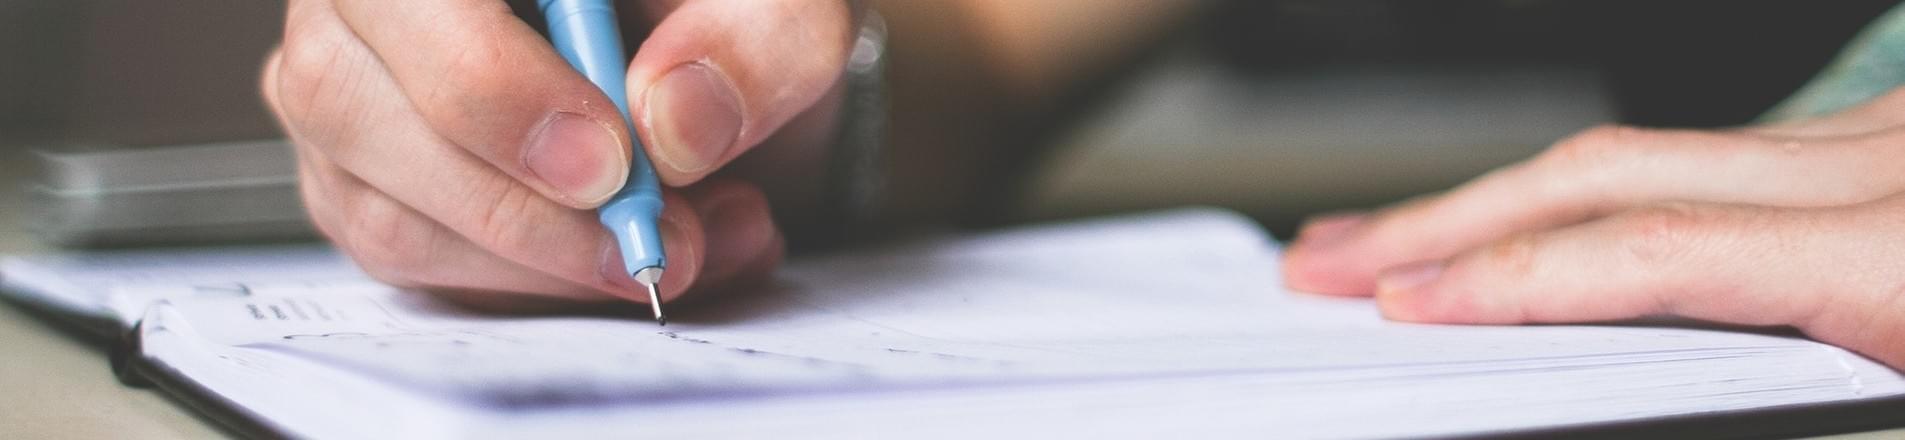 CV errors that drive recruiters crazy!